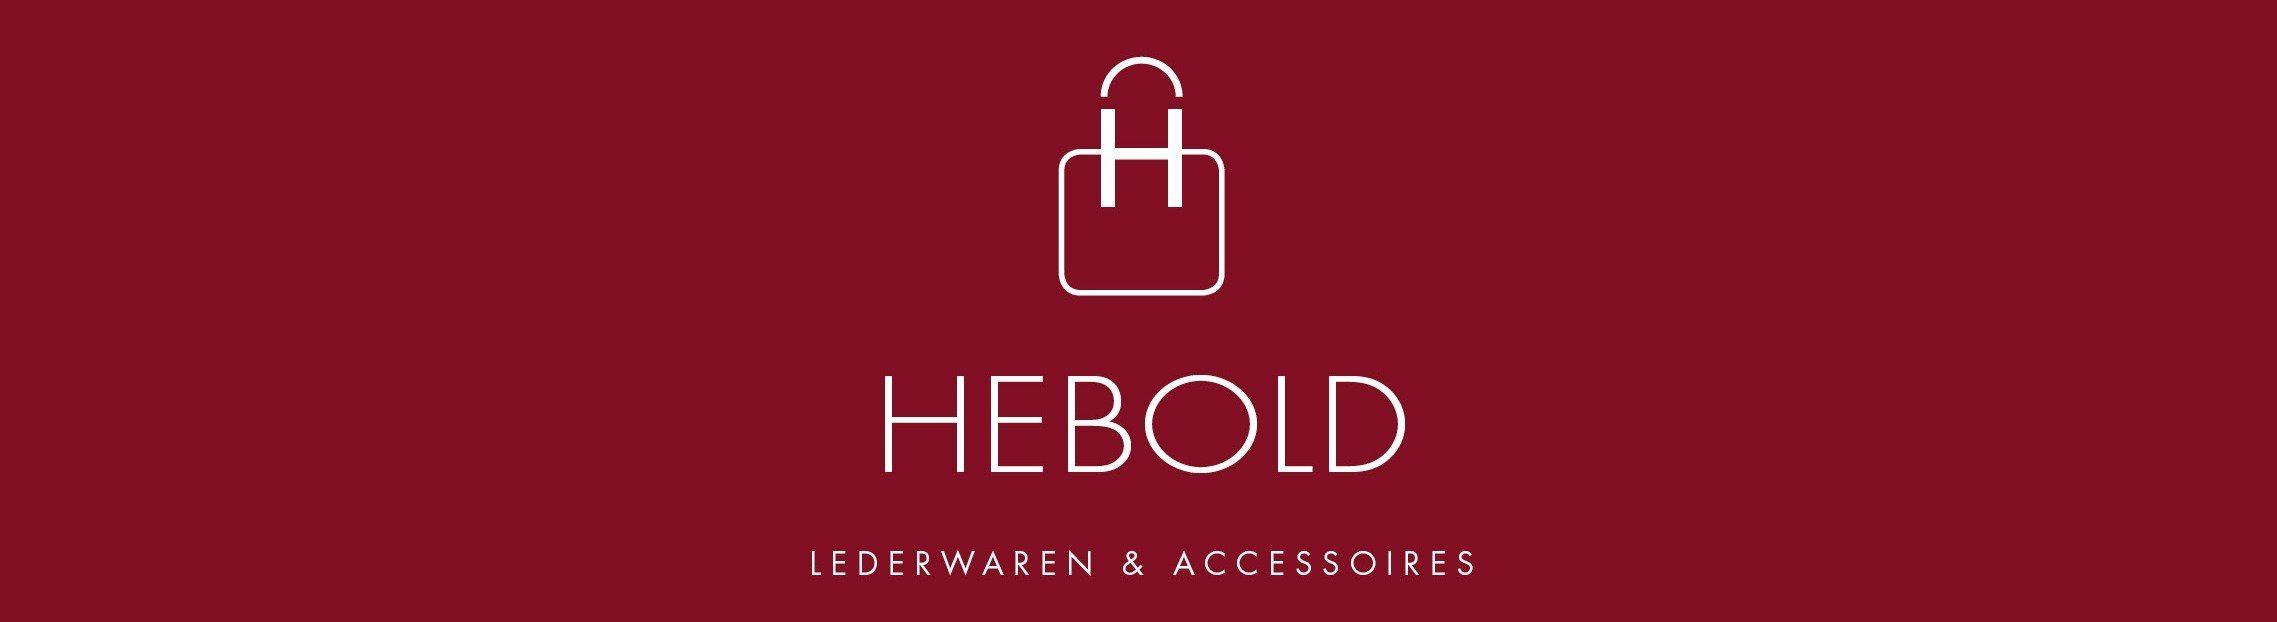 Hebold24